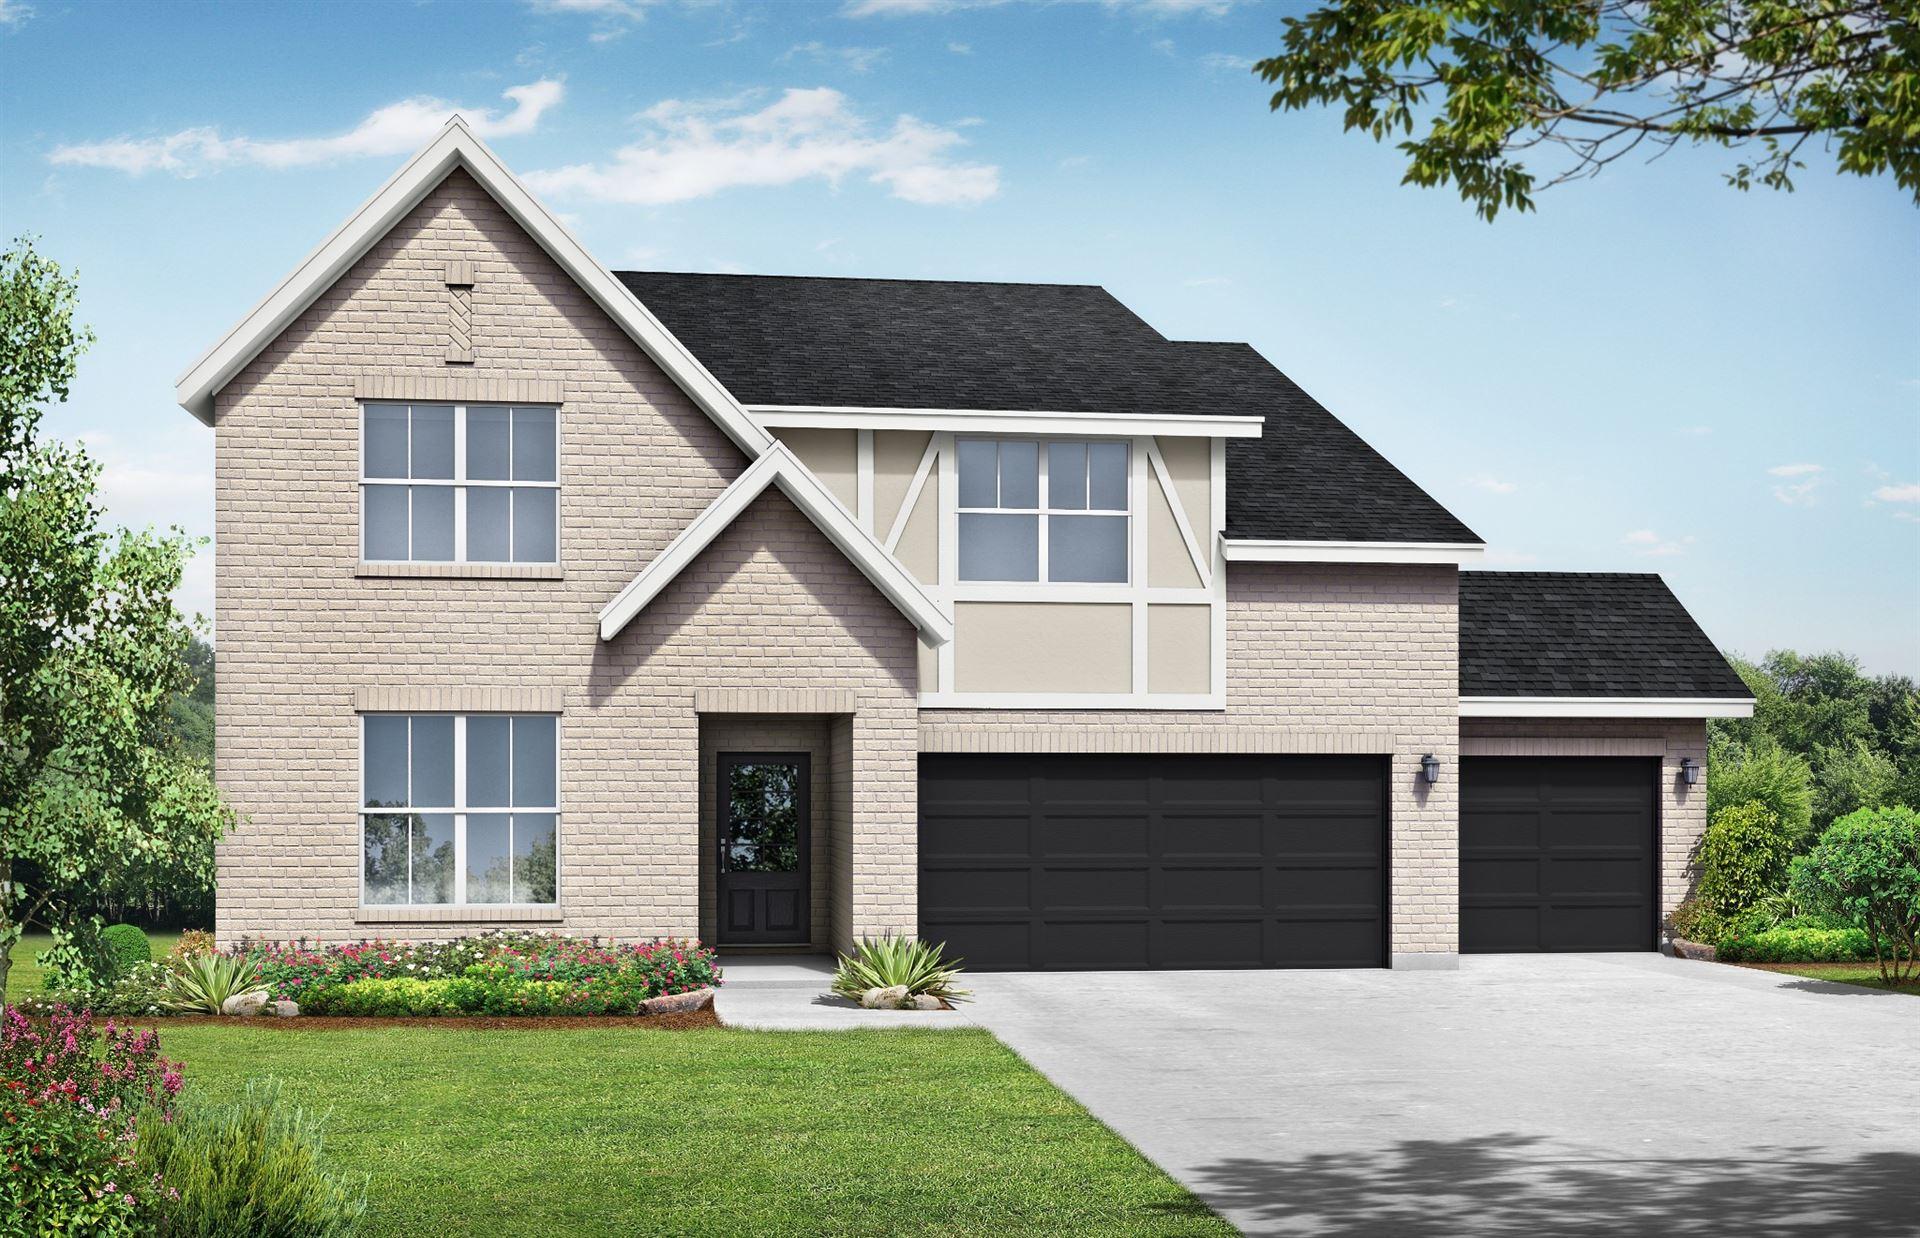 2324 Blue Heron Drive, Murfreesboro, TN 37128 - MLS#: 2284517